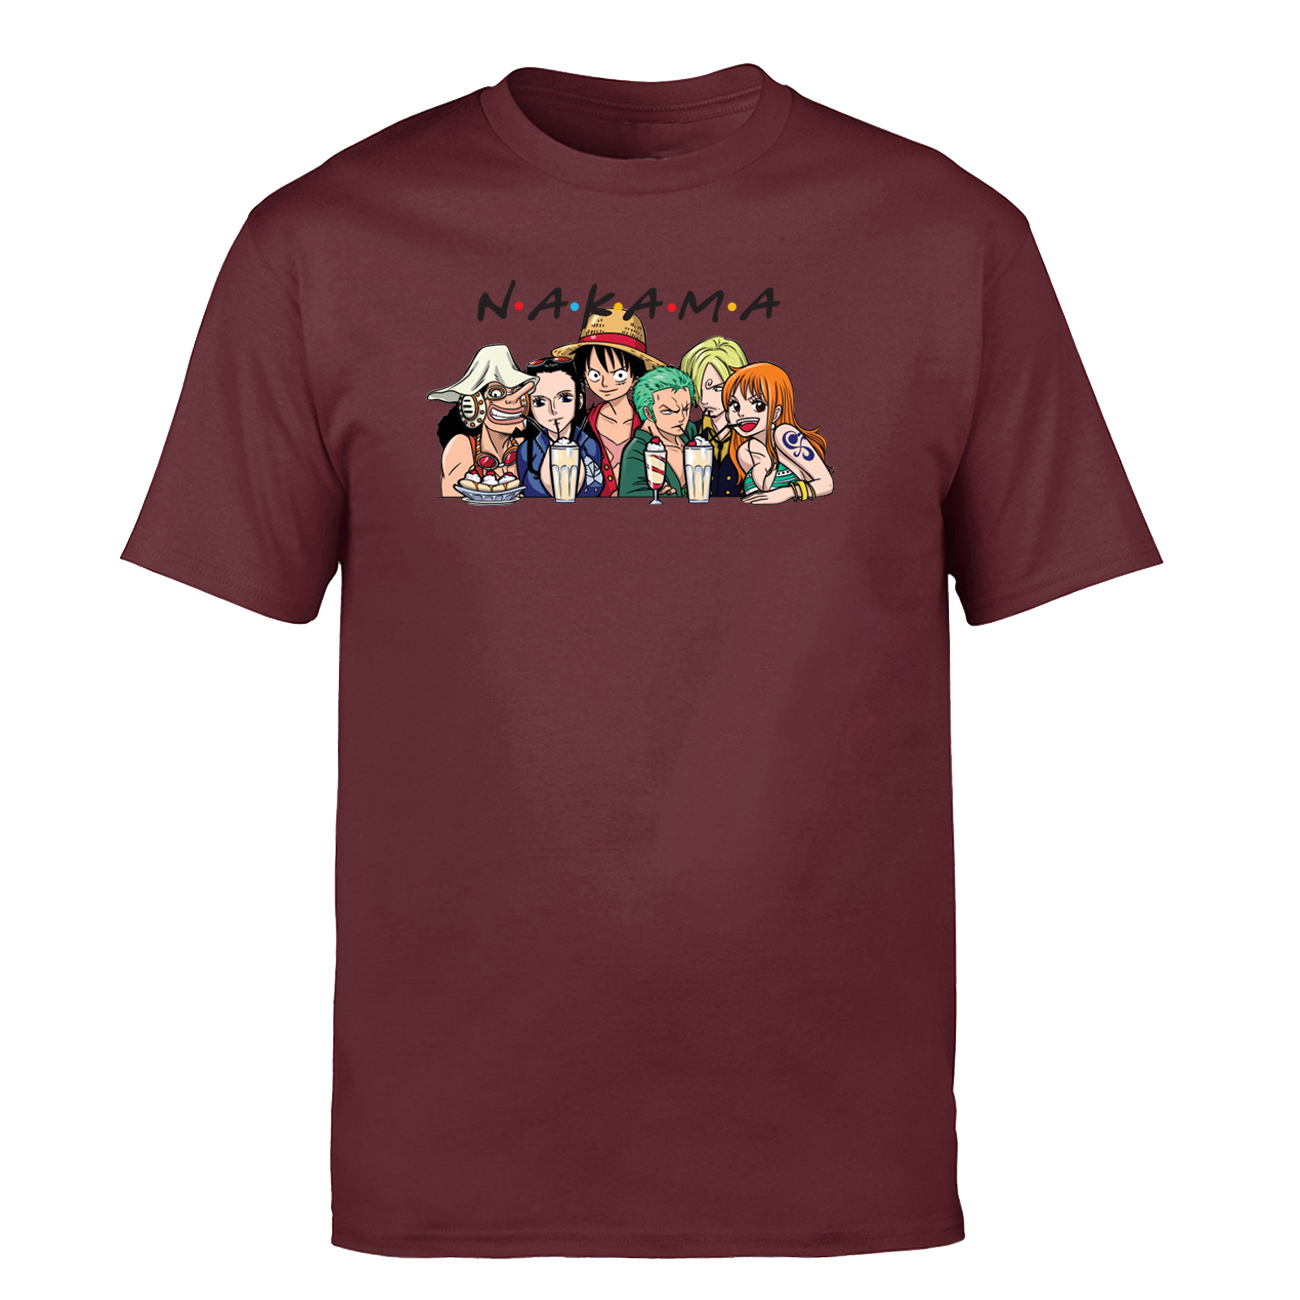 One Piece Pirate Monkey D Luffy Japanese Anime T Shirt Black Size S-3XL